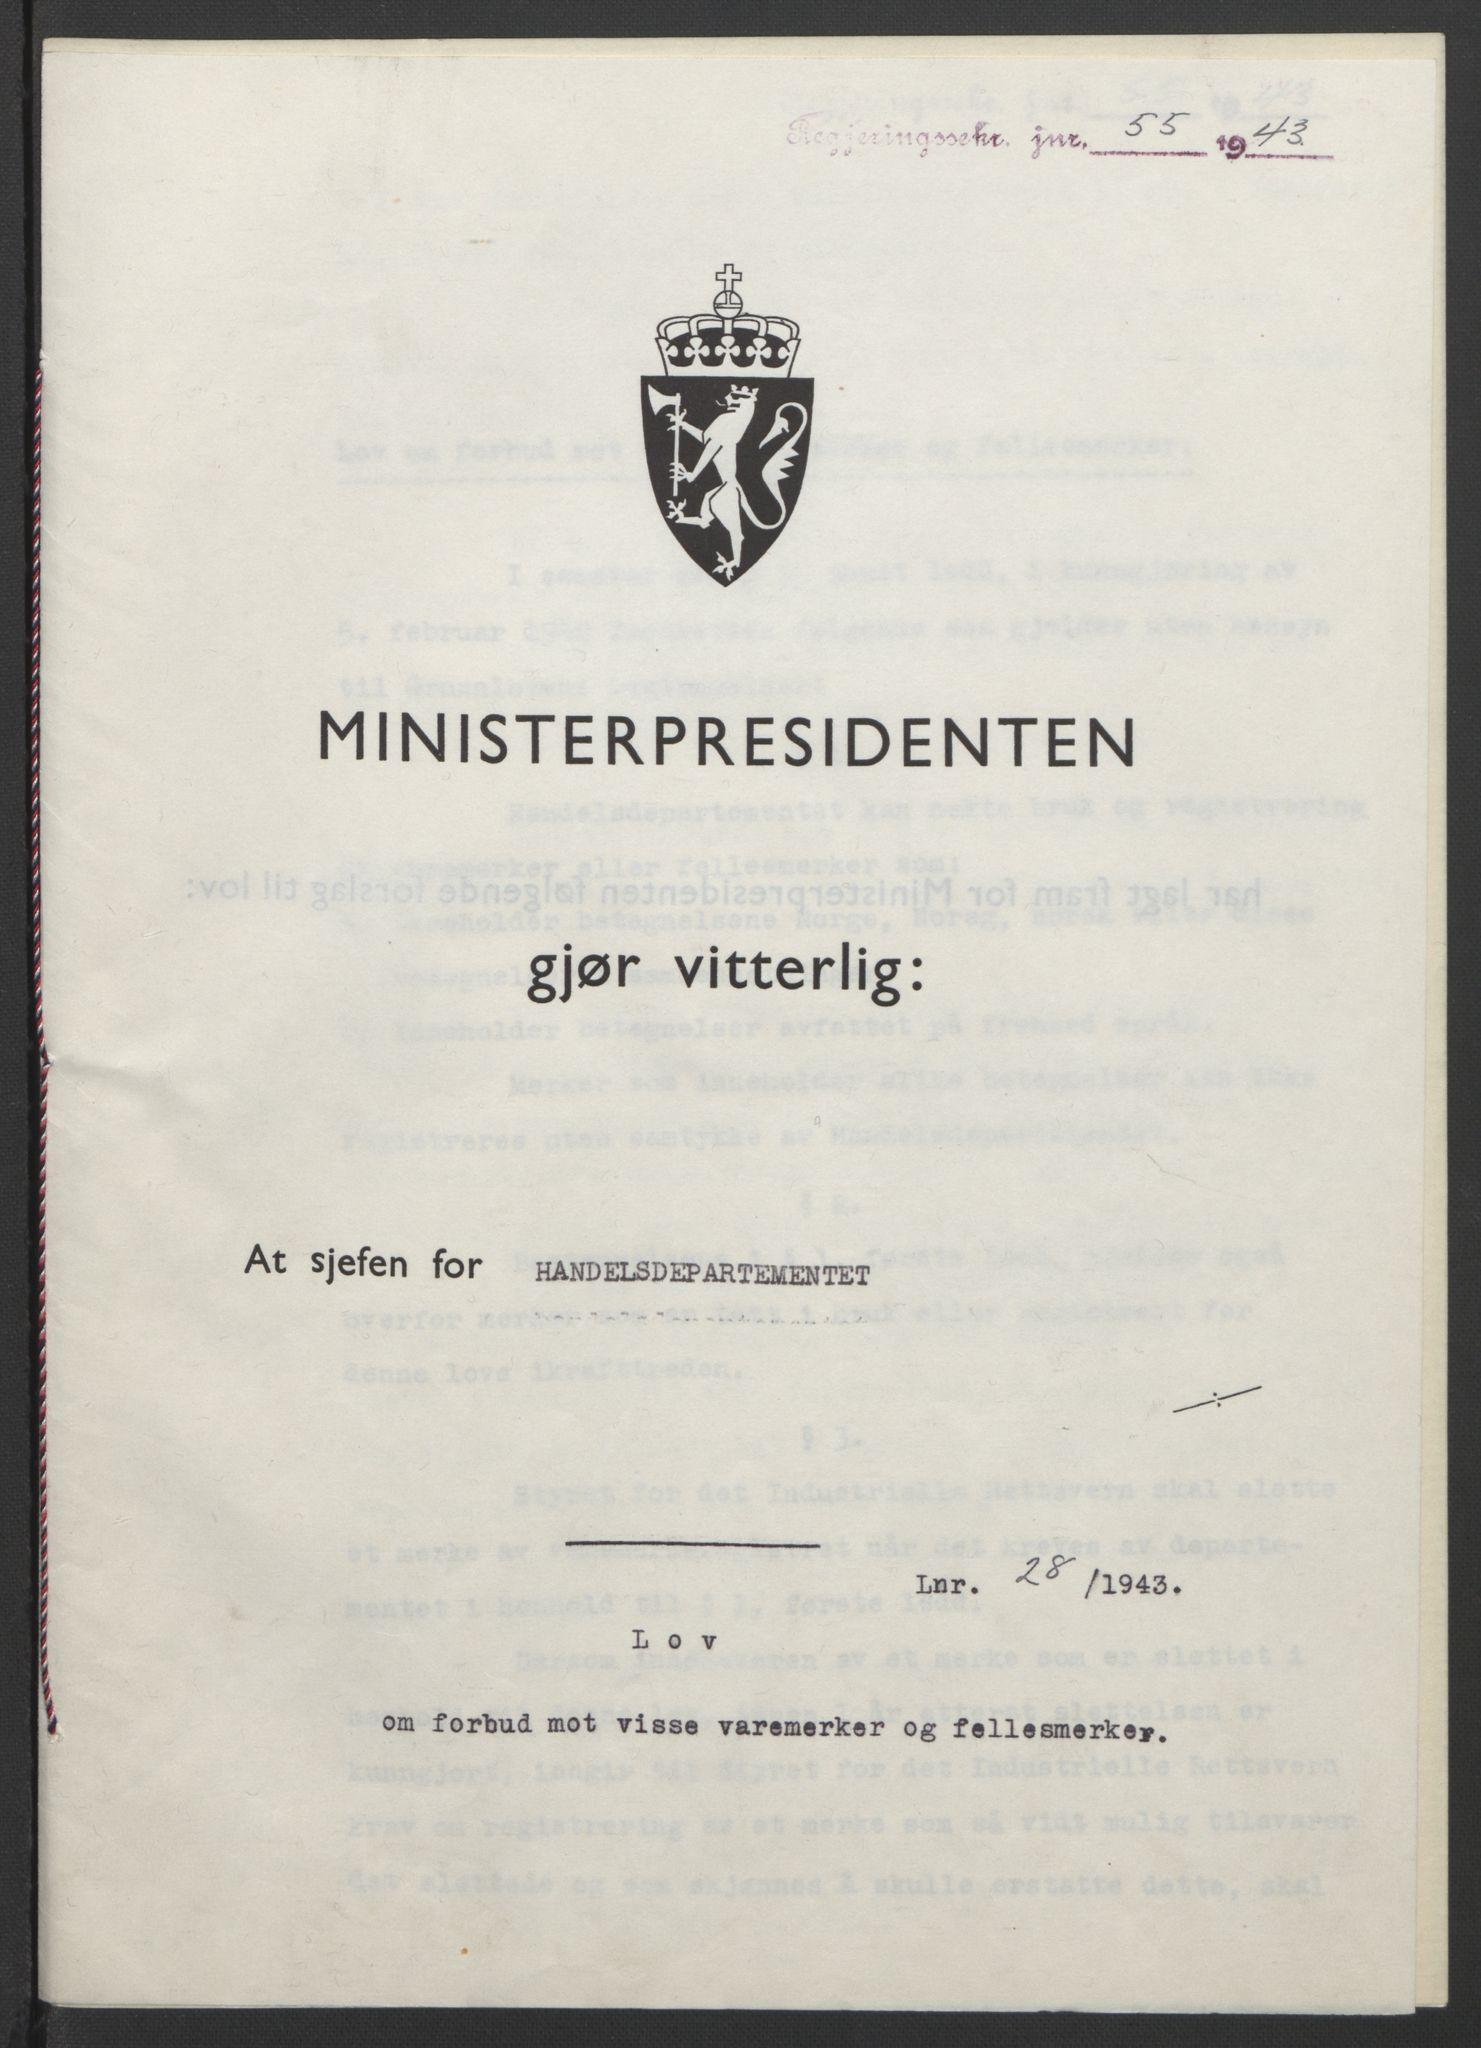 RA, NS-administrasjonen 1940-1945 (Statsrådsekretariatet, de kommisariske statsråder mm), D/Db/L0099: Lover, 1943, s. 114